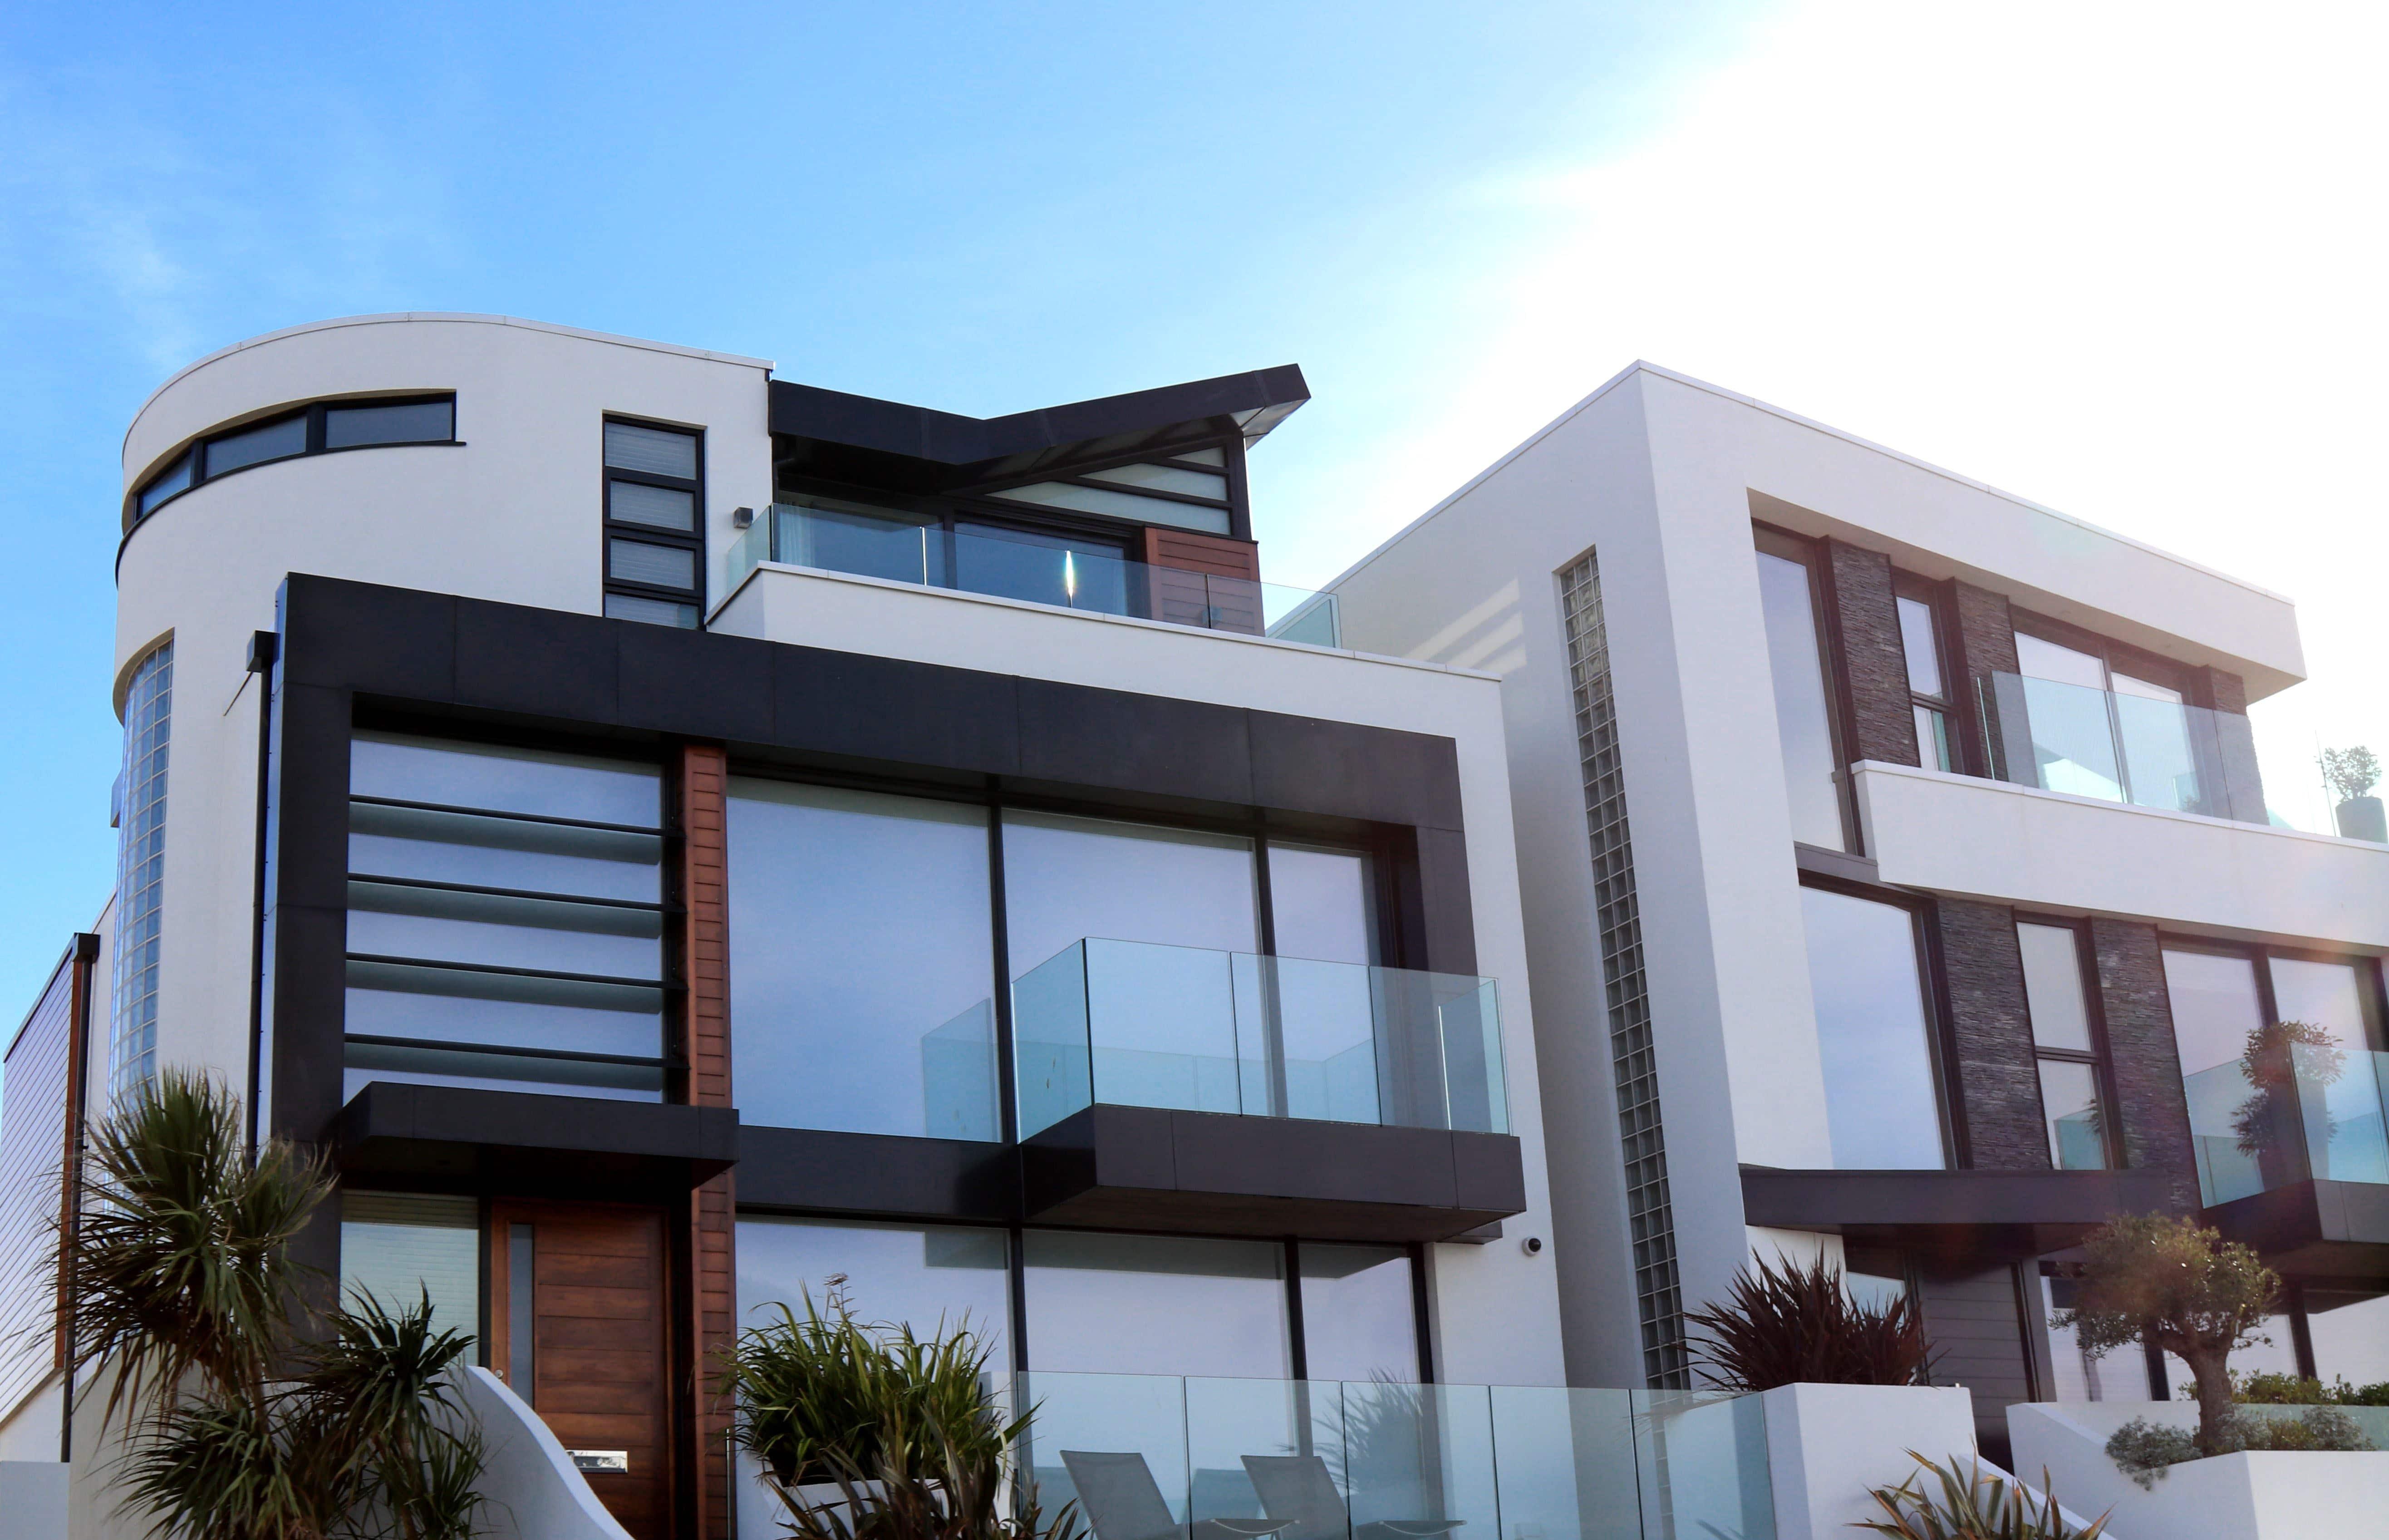 façade d'appartements de luxe